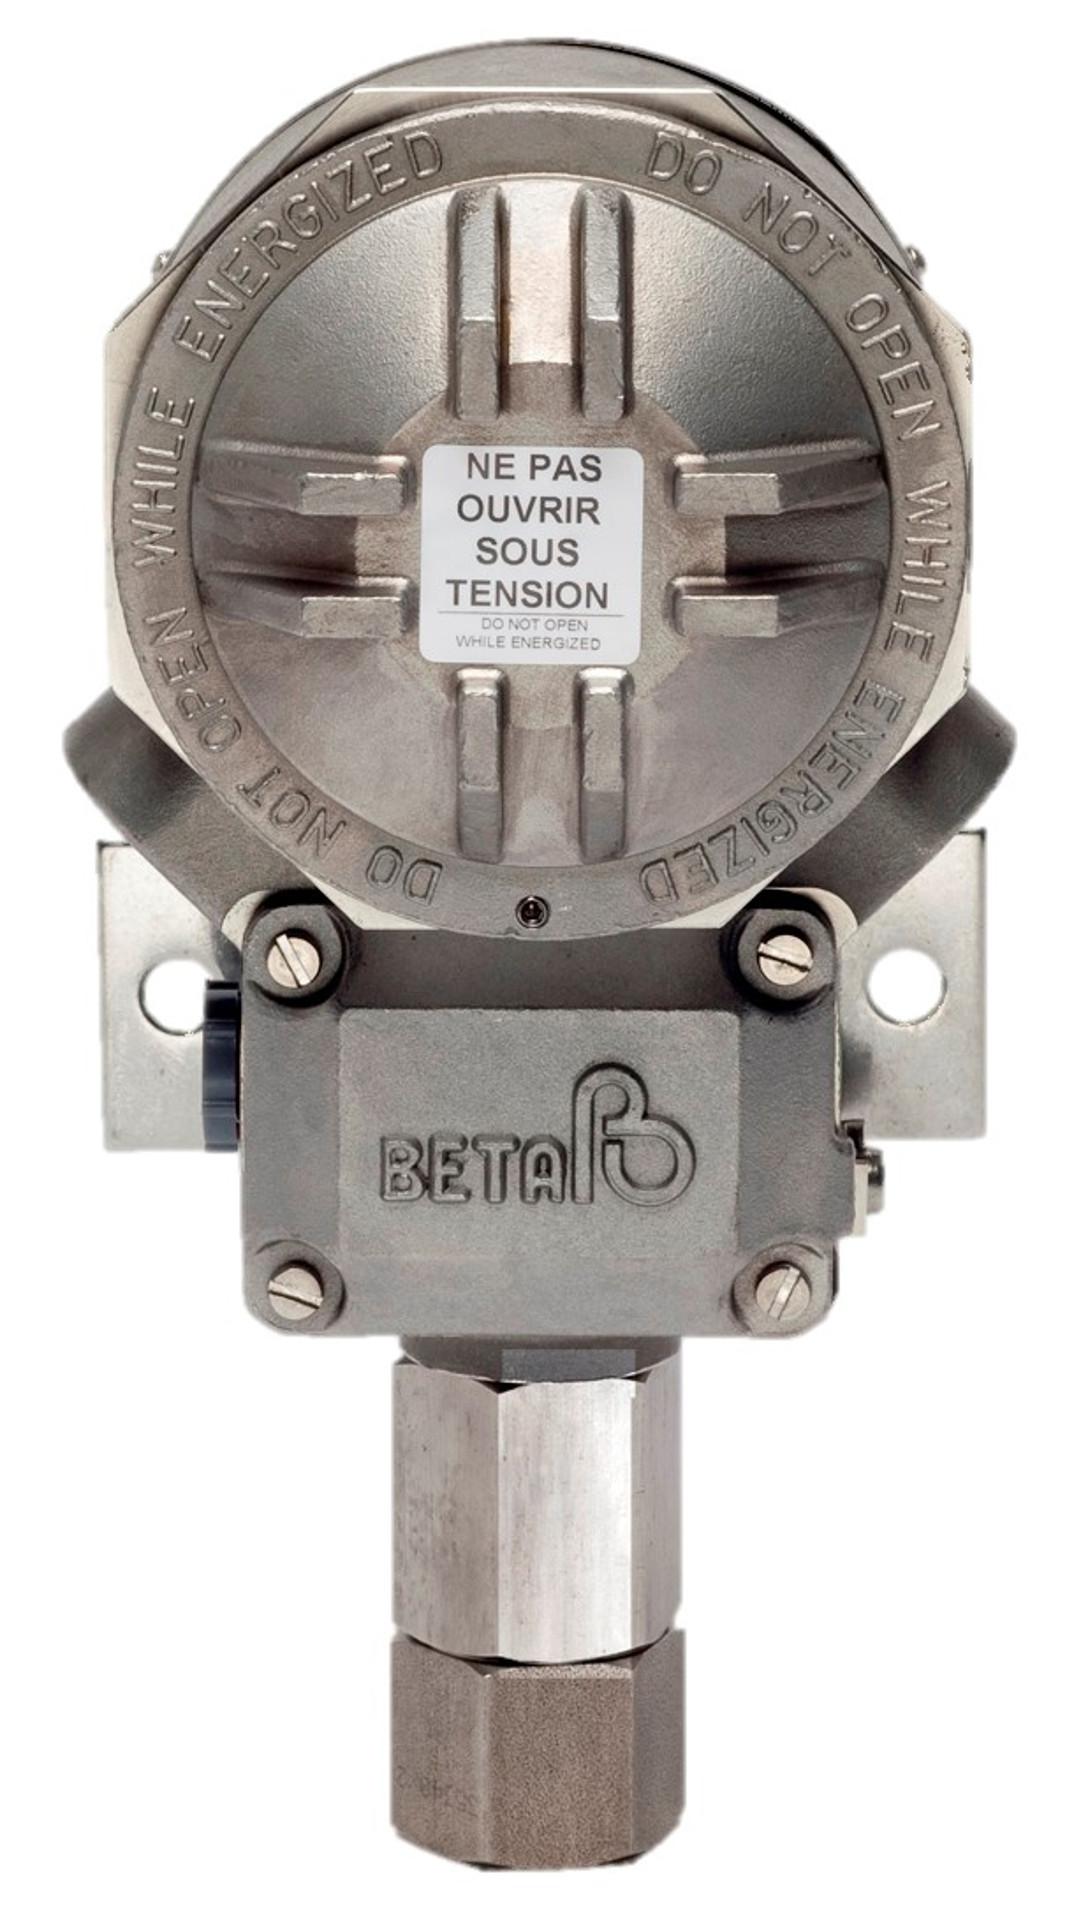 Trykkbryter Temperaturbryter Pressure temperatur switch Explosion proof safety SIL2 Beta